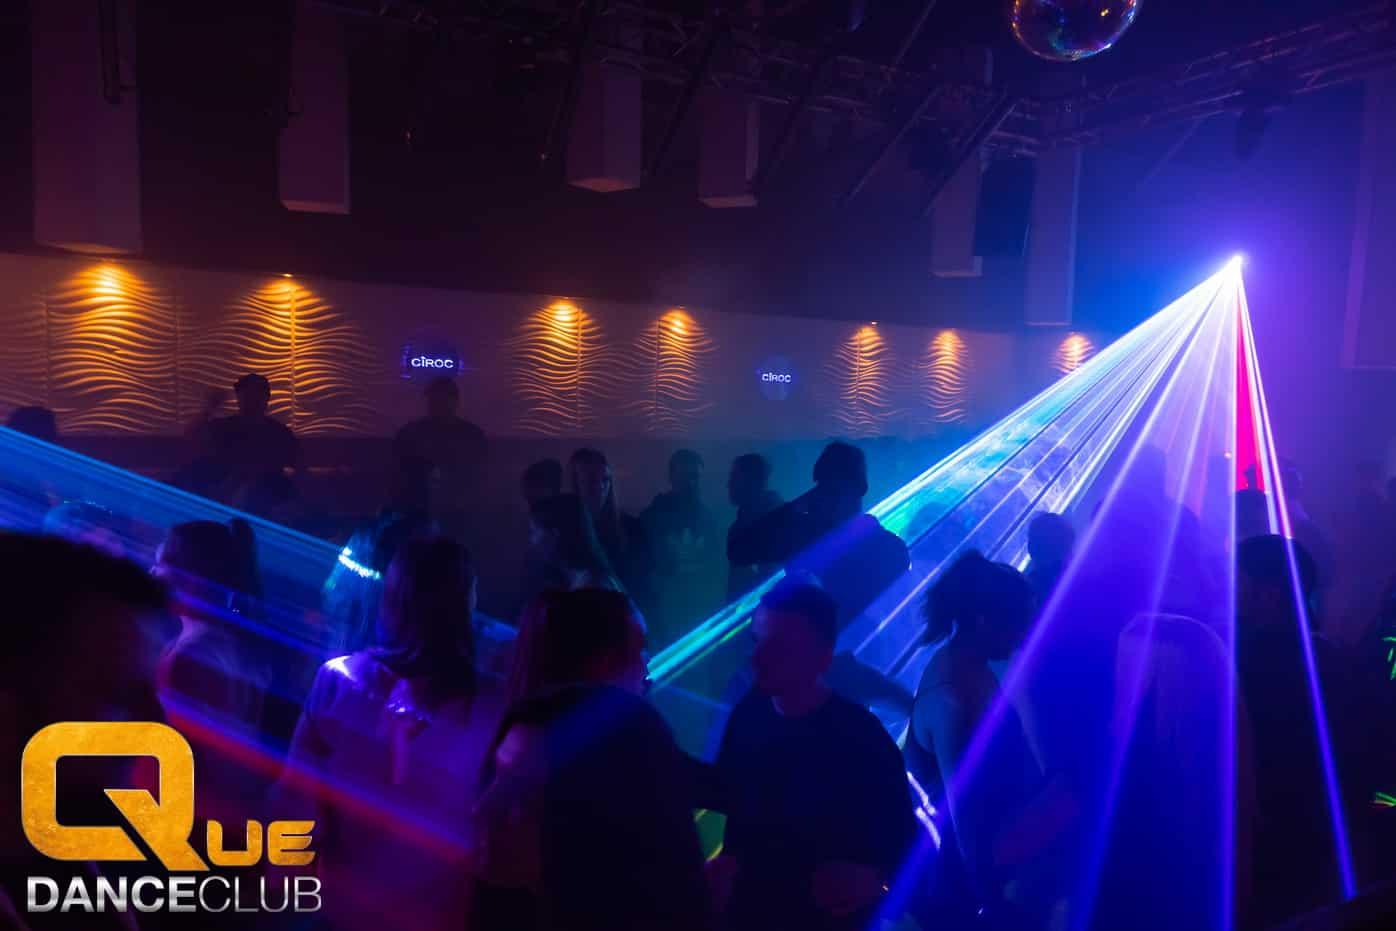 2018_11_23_Que_Danceclub_BLCK_FRDY_United_Nightlife_Scene_Timo_030